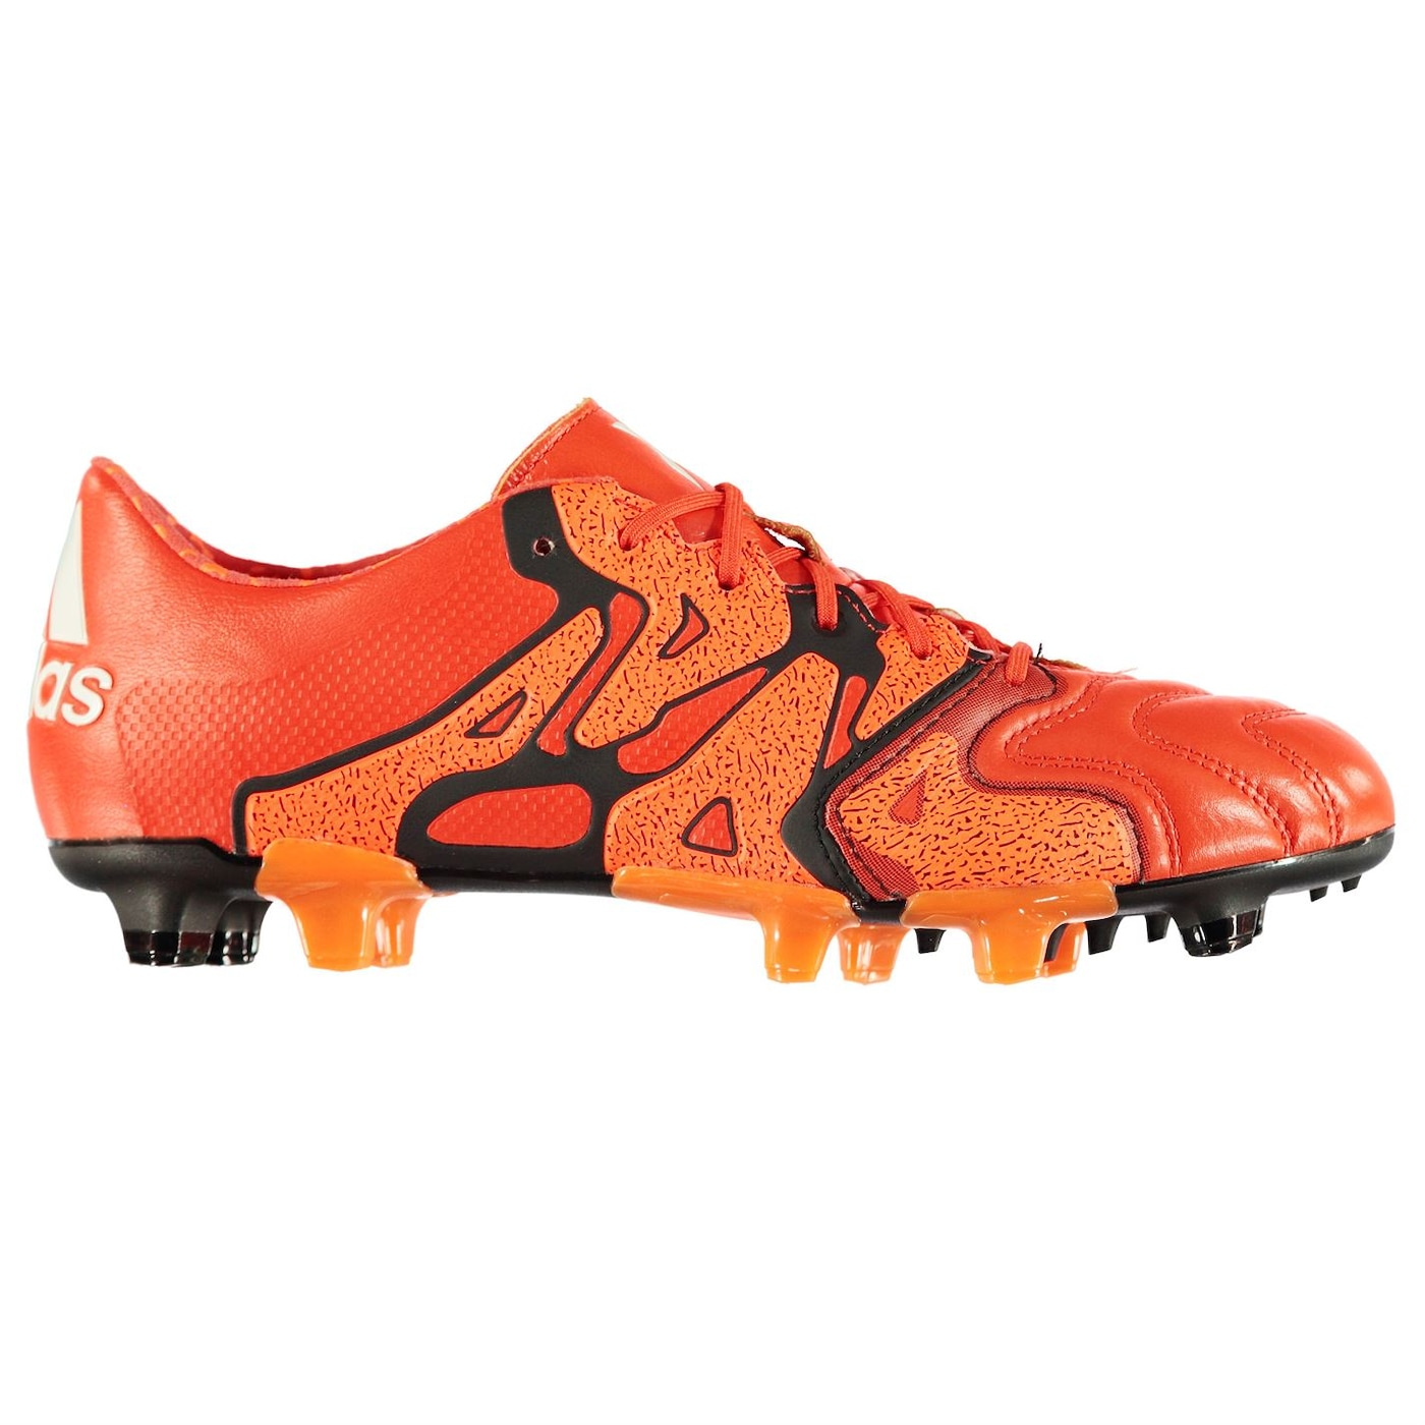 Adidas X 15.1 Leather FG Mens Football Boots